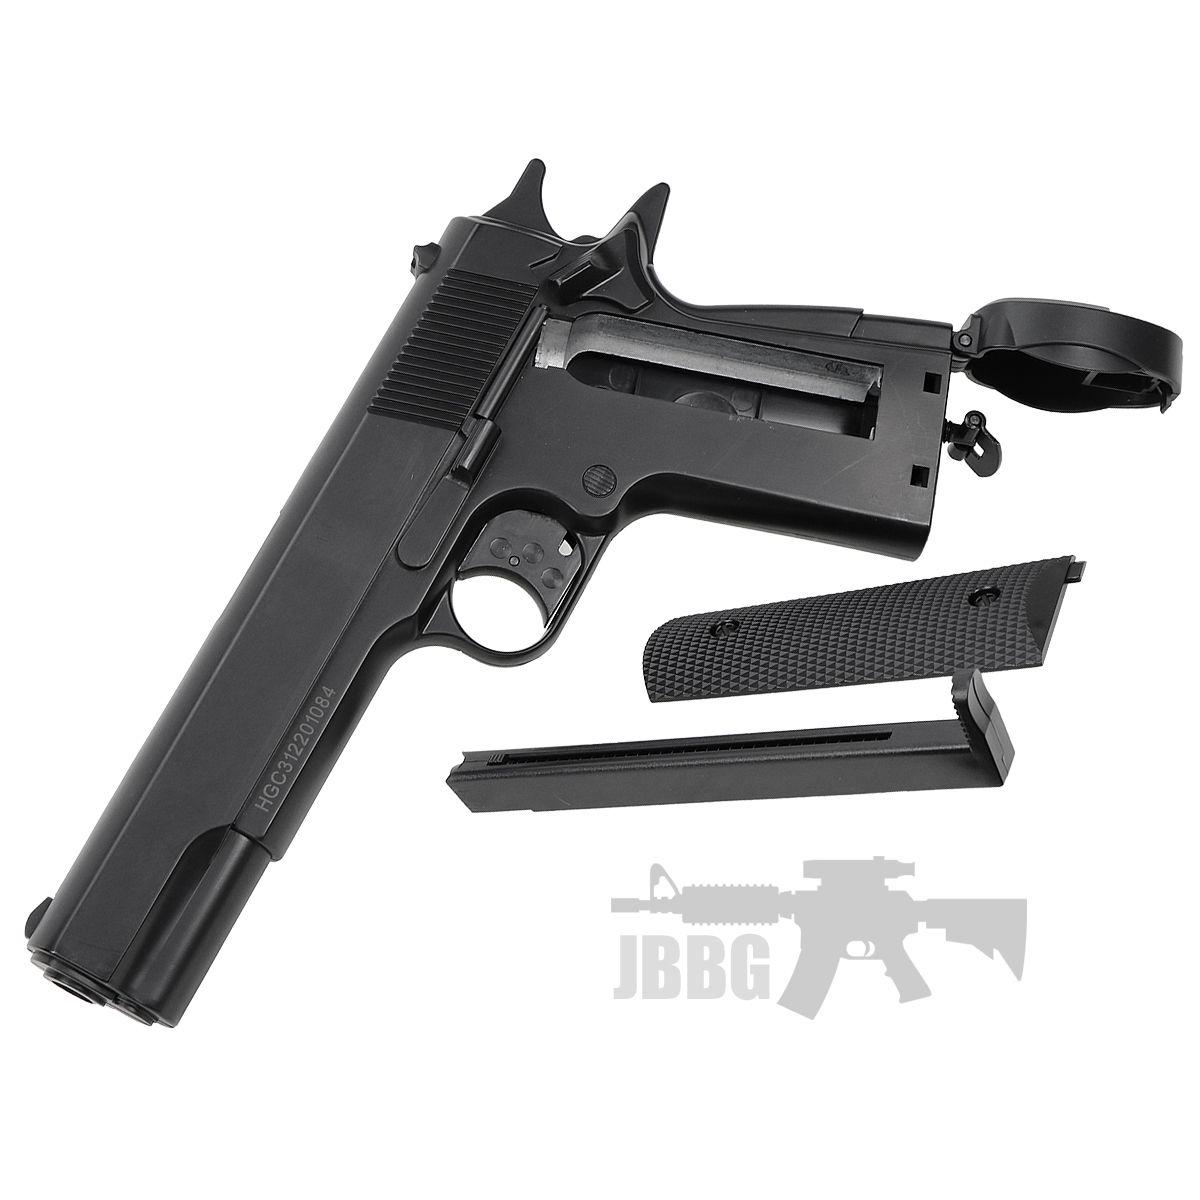 hgc312 airsoft gas pistol jbbg 5